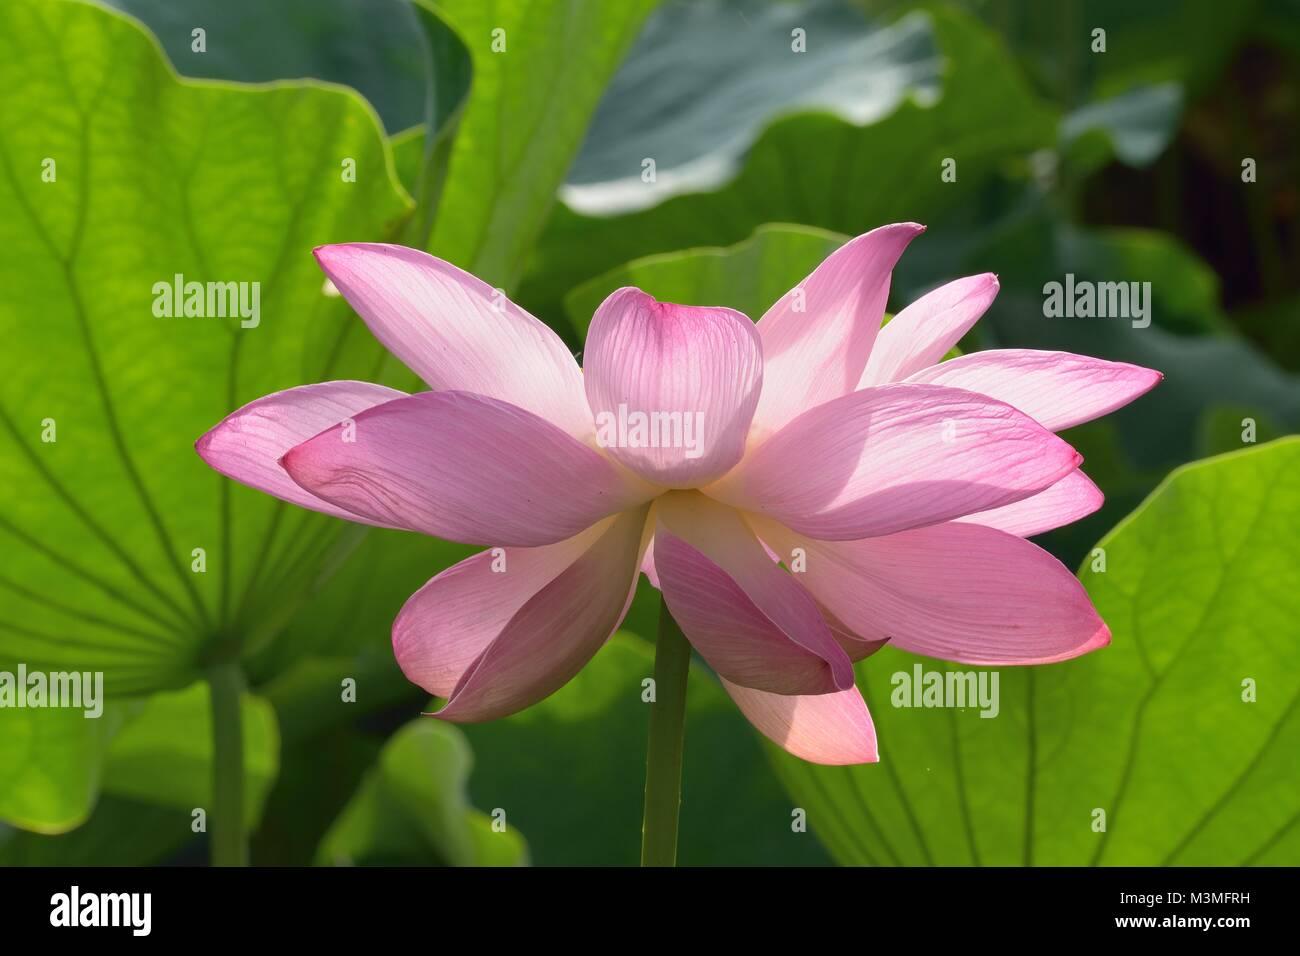 Pink Lotus Flowers Stock Photos Pink Lotus Flowers Stock Images